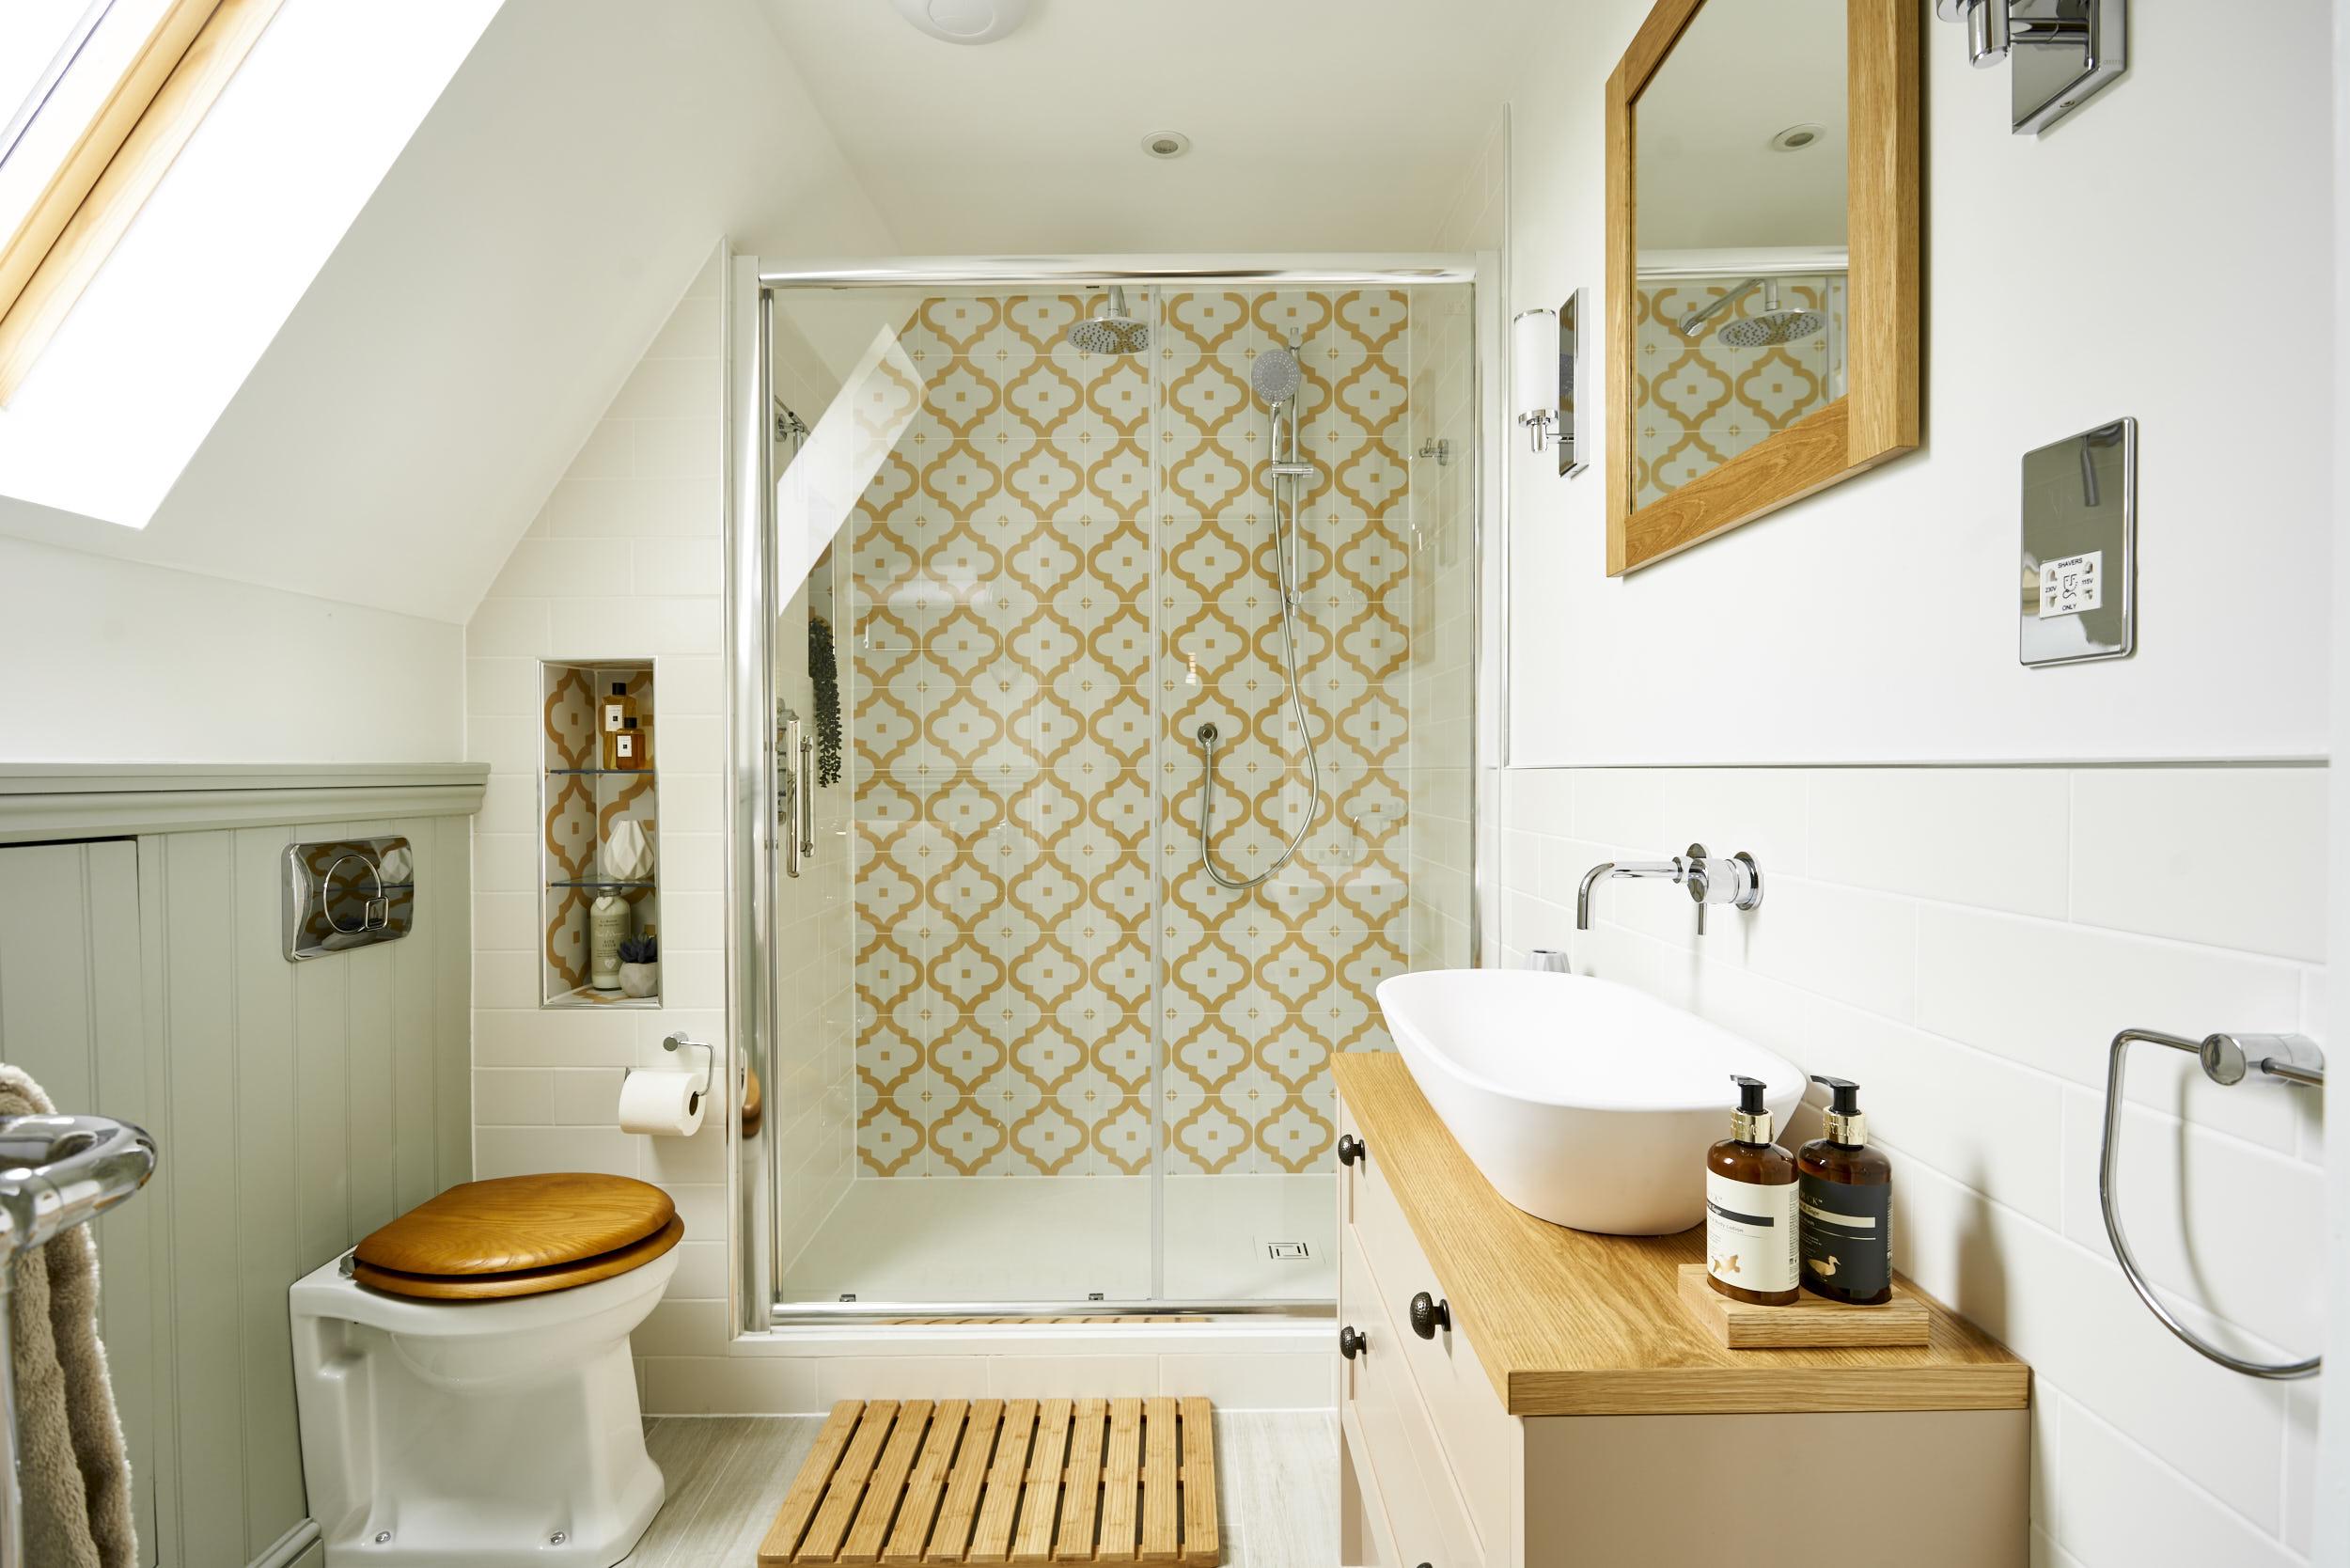 9 Design Tips for a Luxury Attic Bathroom You'll Love ... on Small Bathroom Ideas Uk id=13224